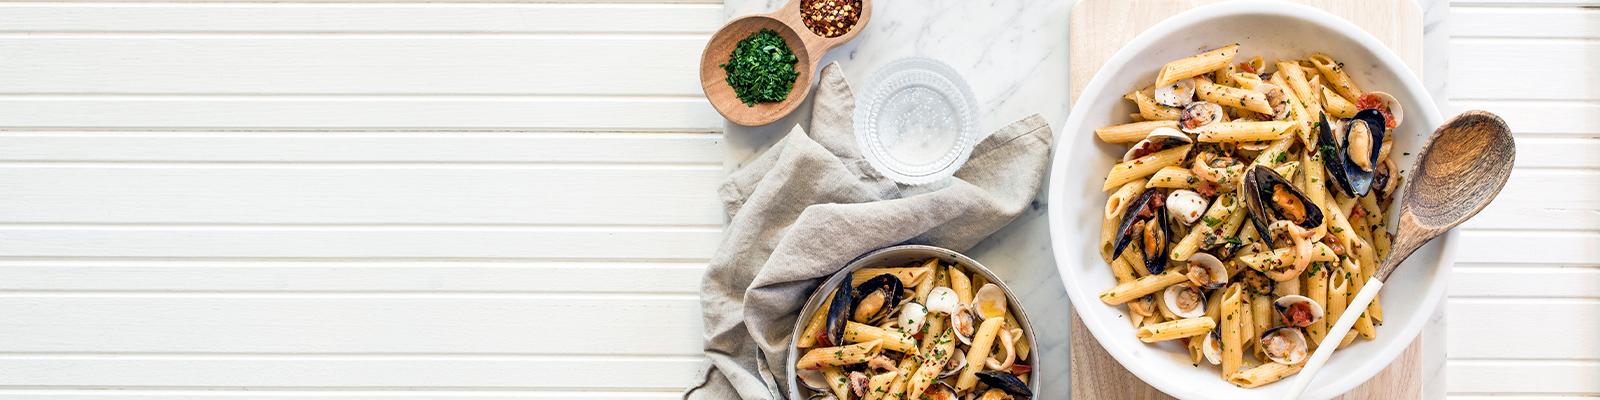 Pasta Garofalo - Onze Recepten